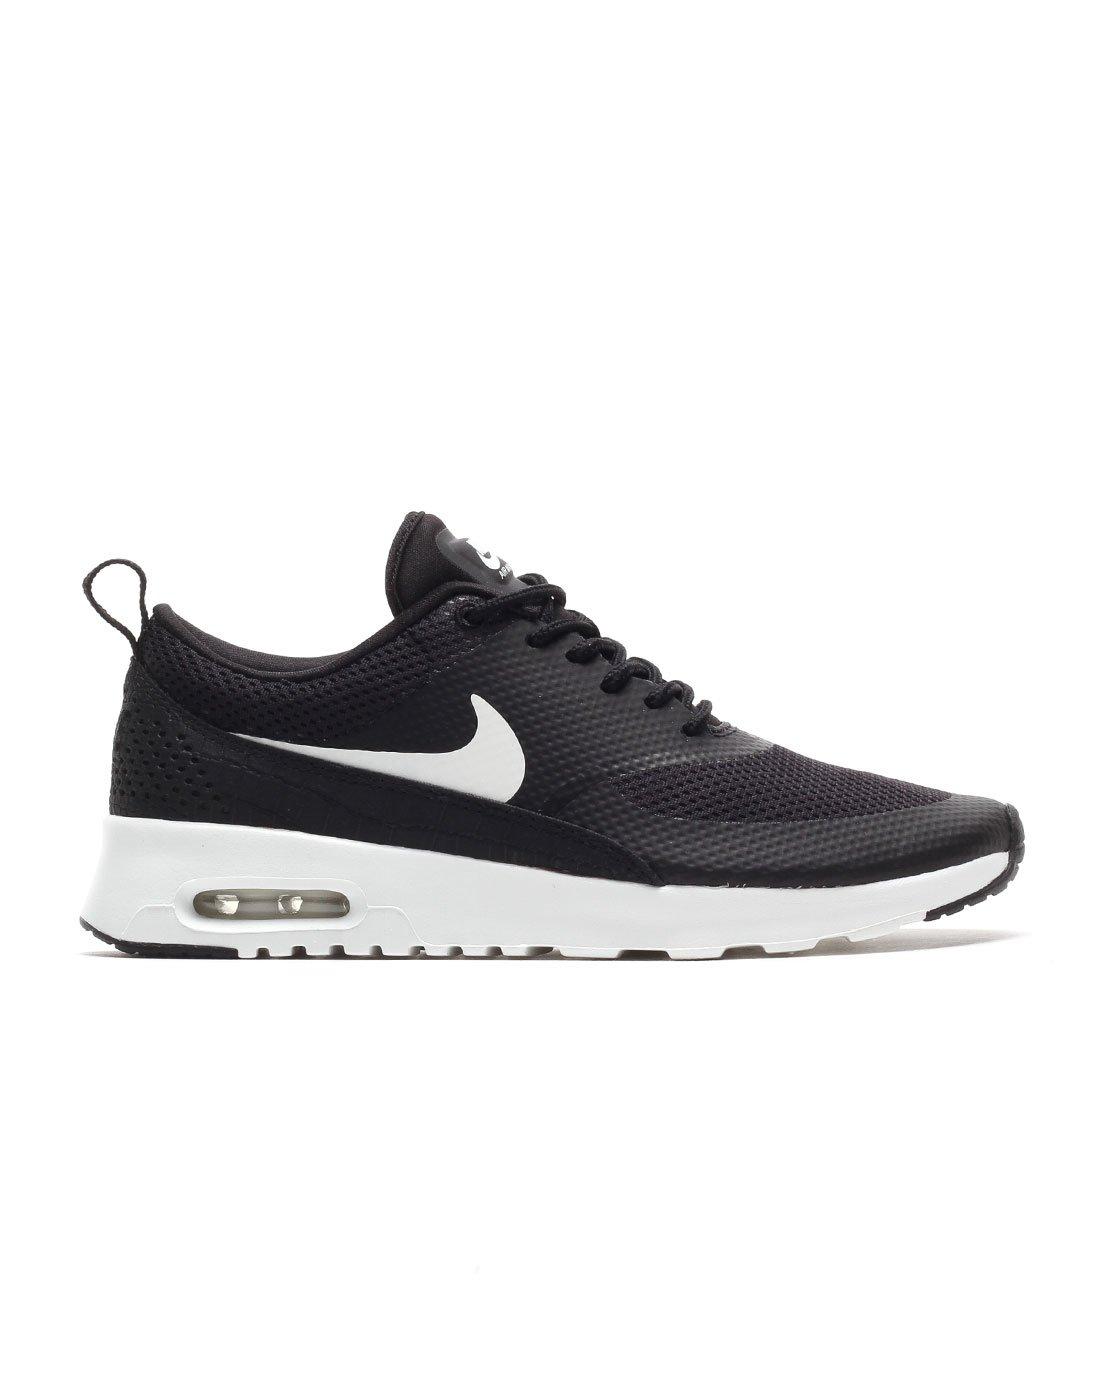 Nike Women's Air Max Thea Black/Summit White Running Shoe 6.5 Women US